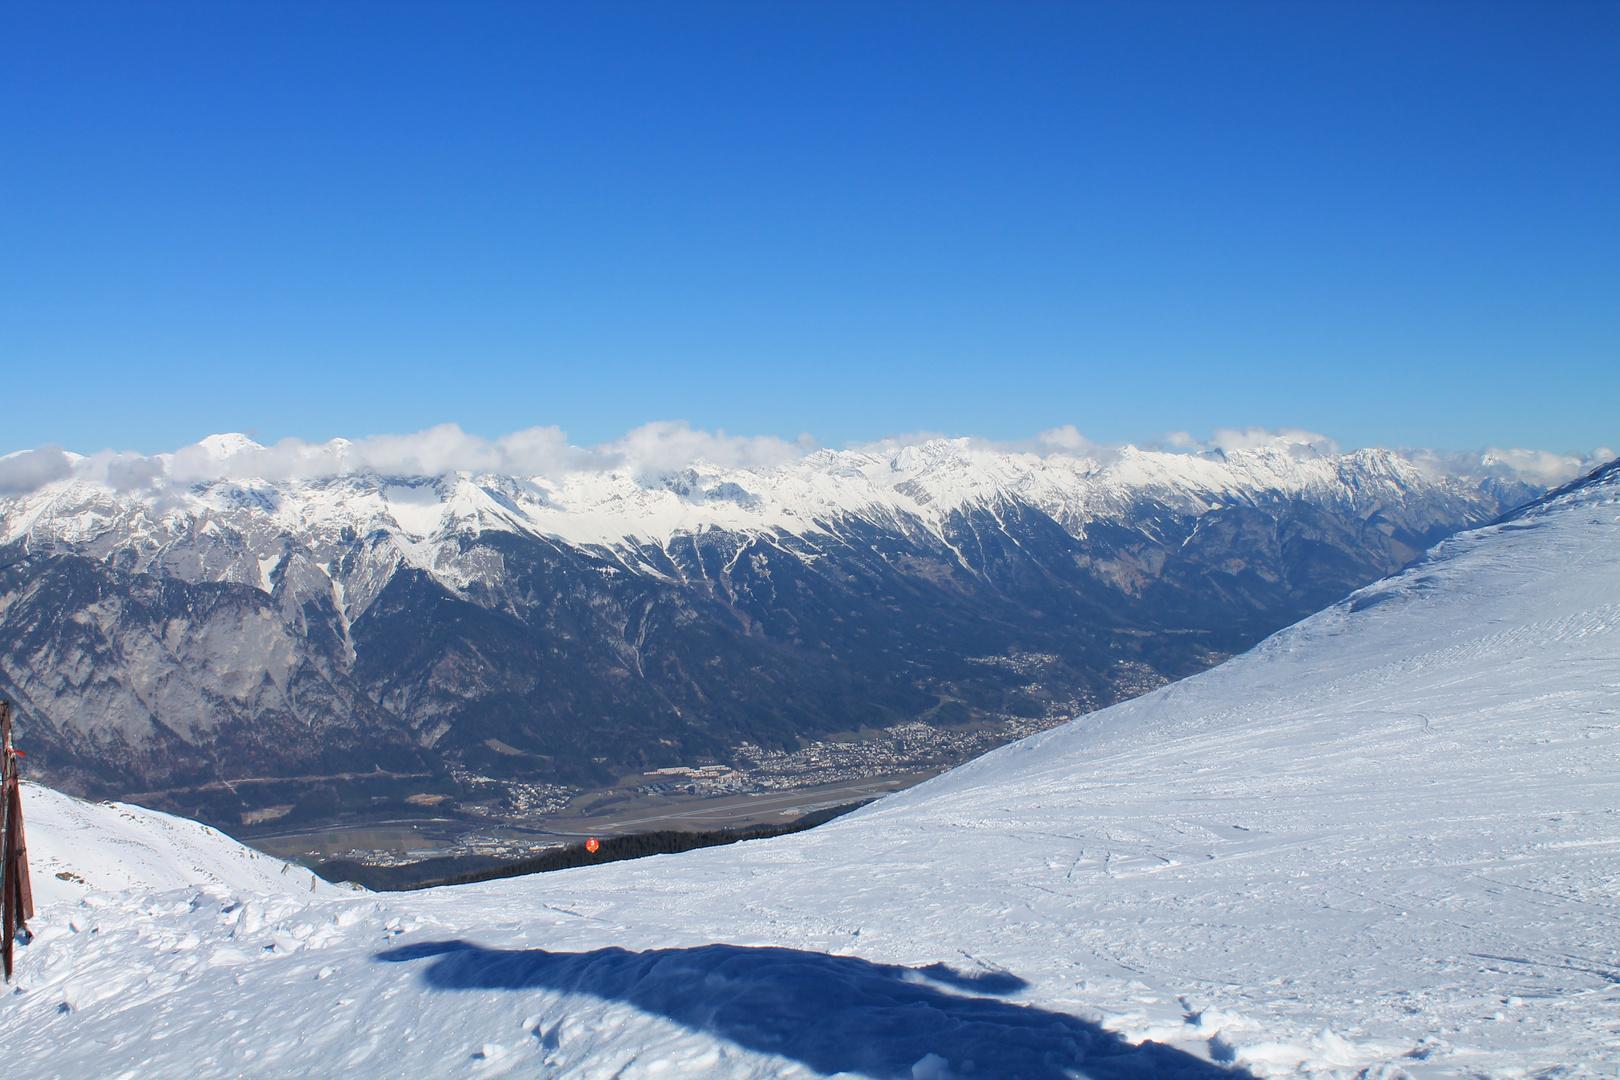 Blick bis zum Flughafen Innsbruck